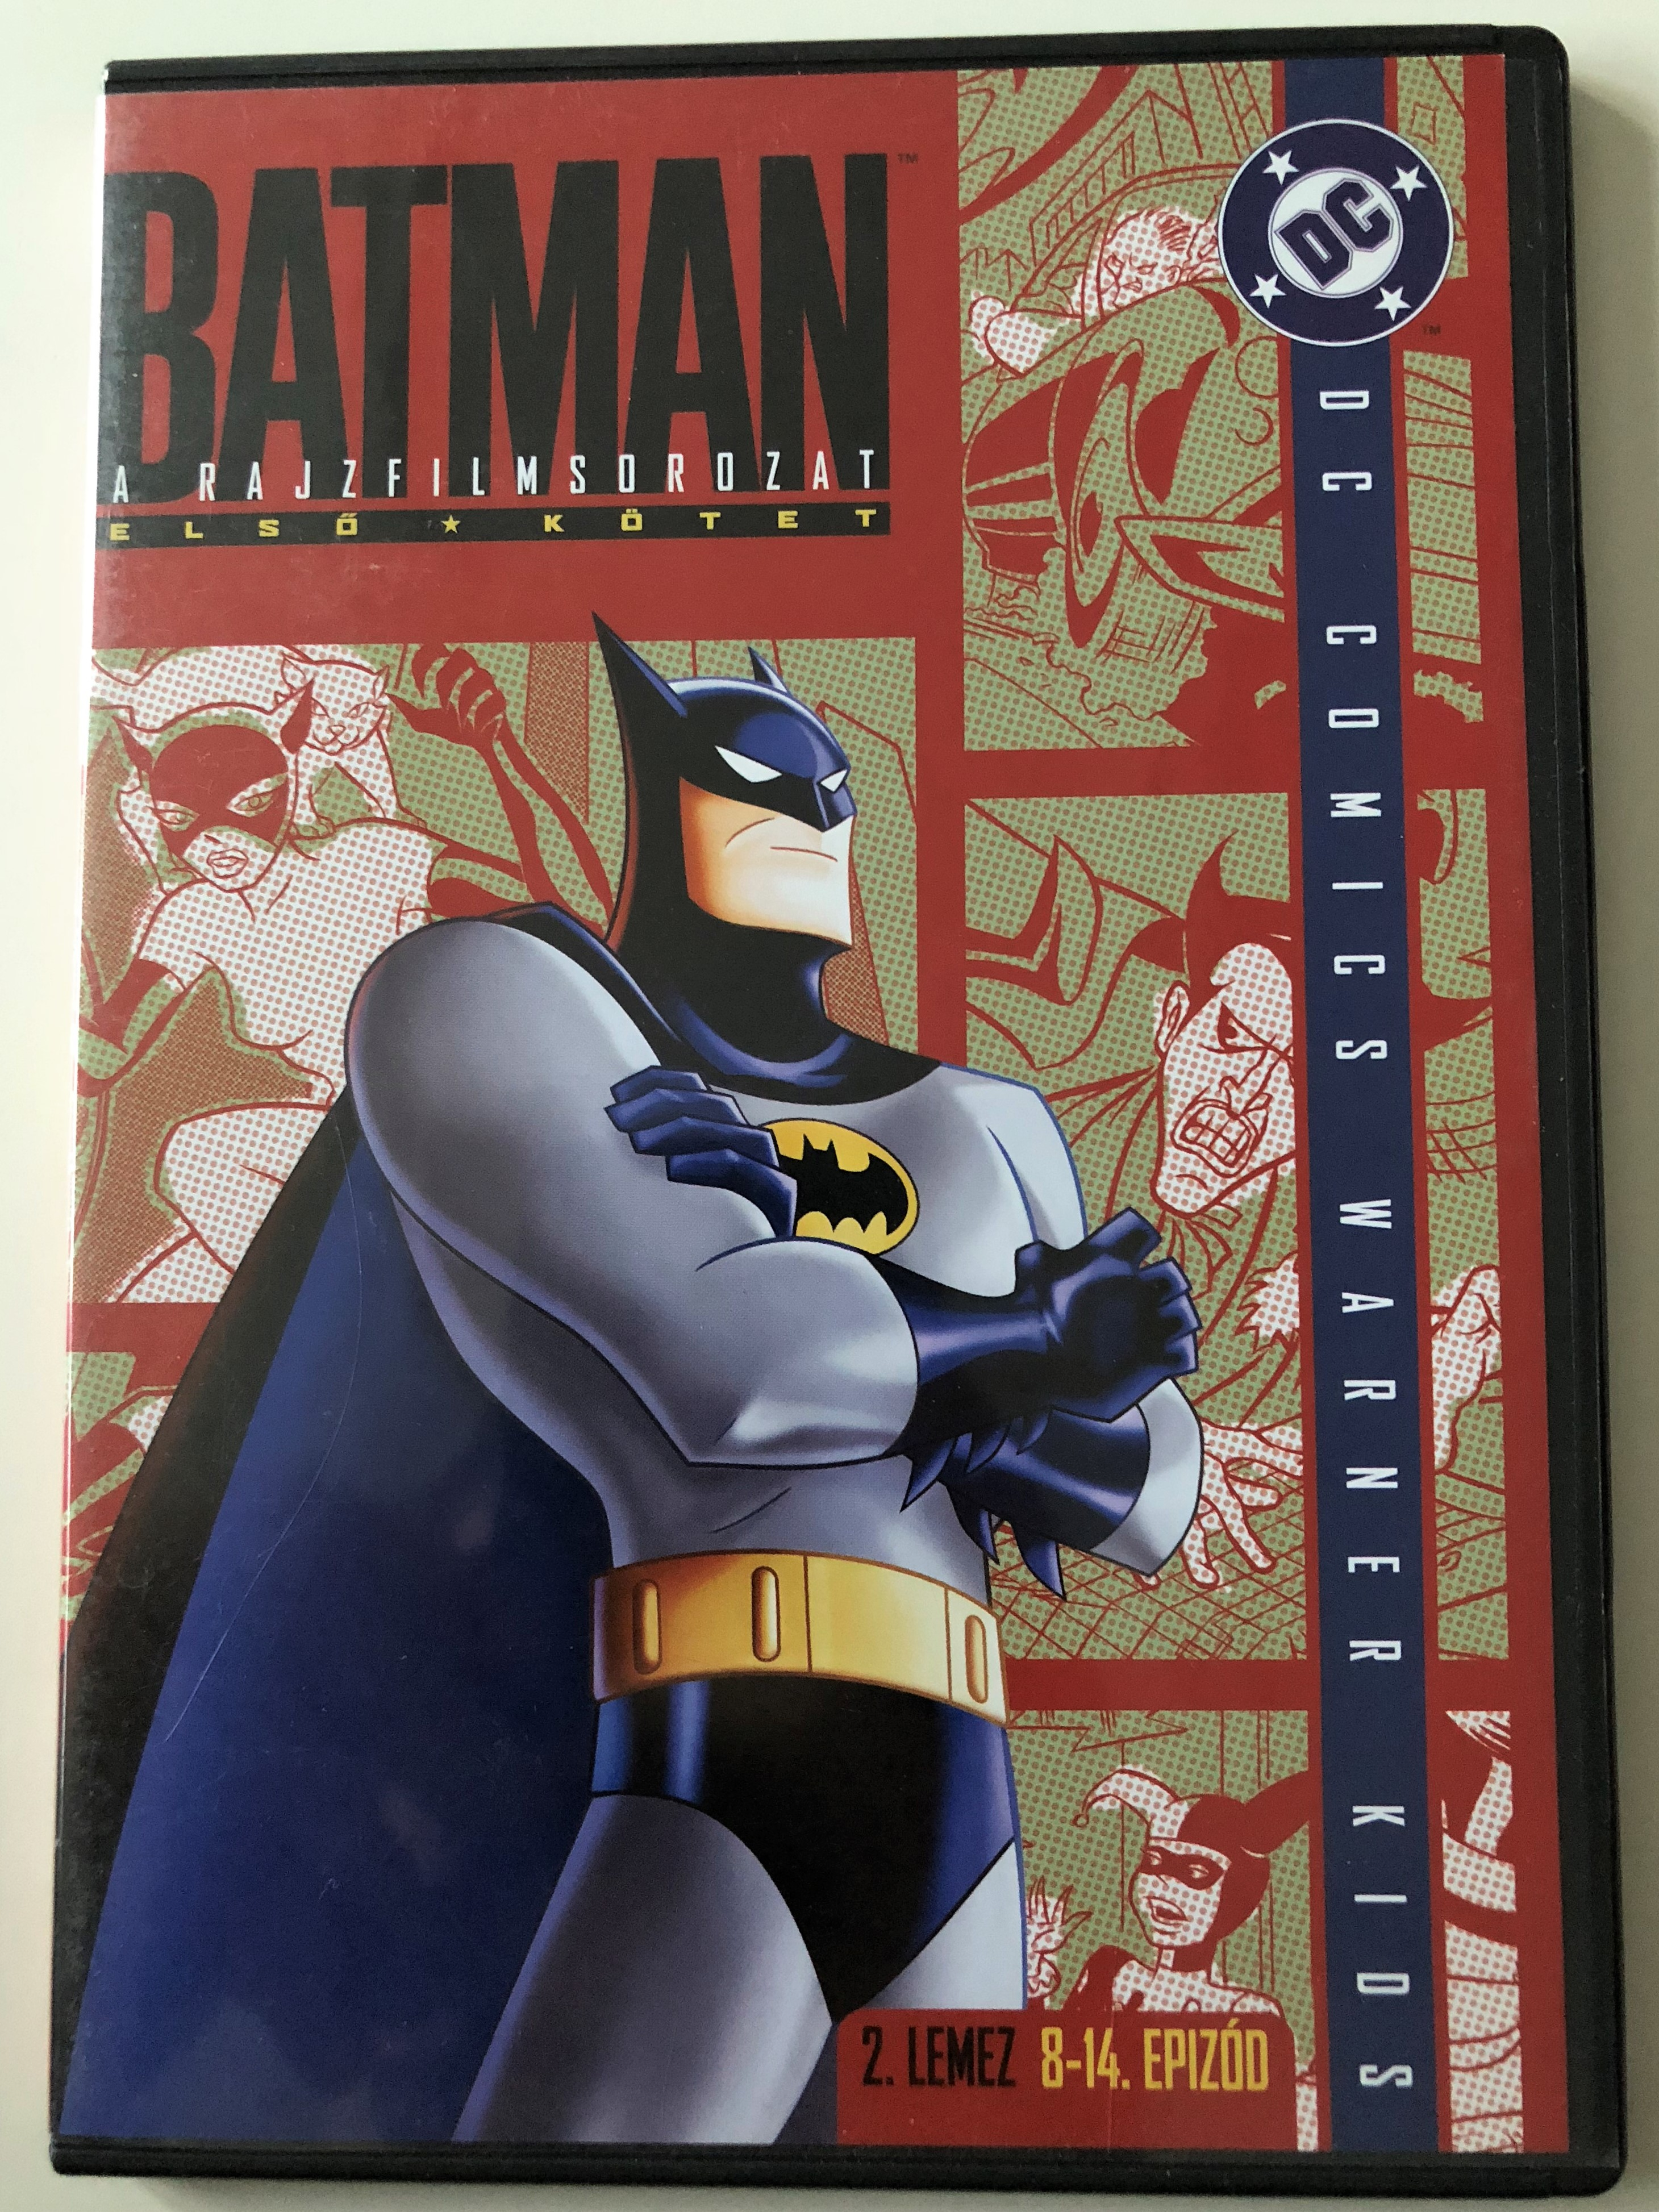 batman-the-animated-series-vol-2.-dvd-2006-batman-a-rajzfilmsorozat-2.-lemez-directed-by-bruce-w.-timm-eric-radomski-1-.jpg